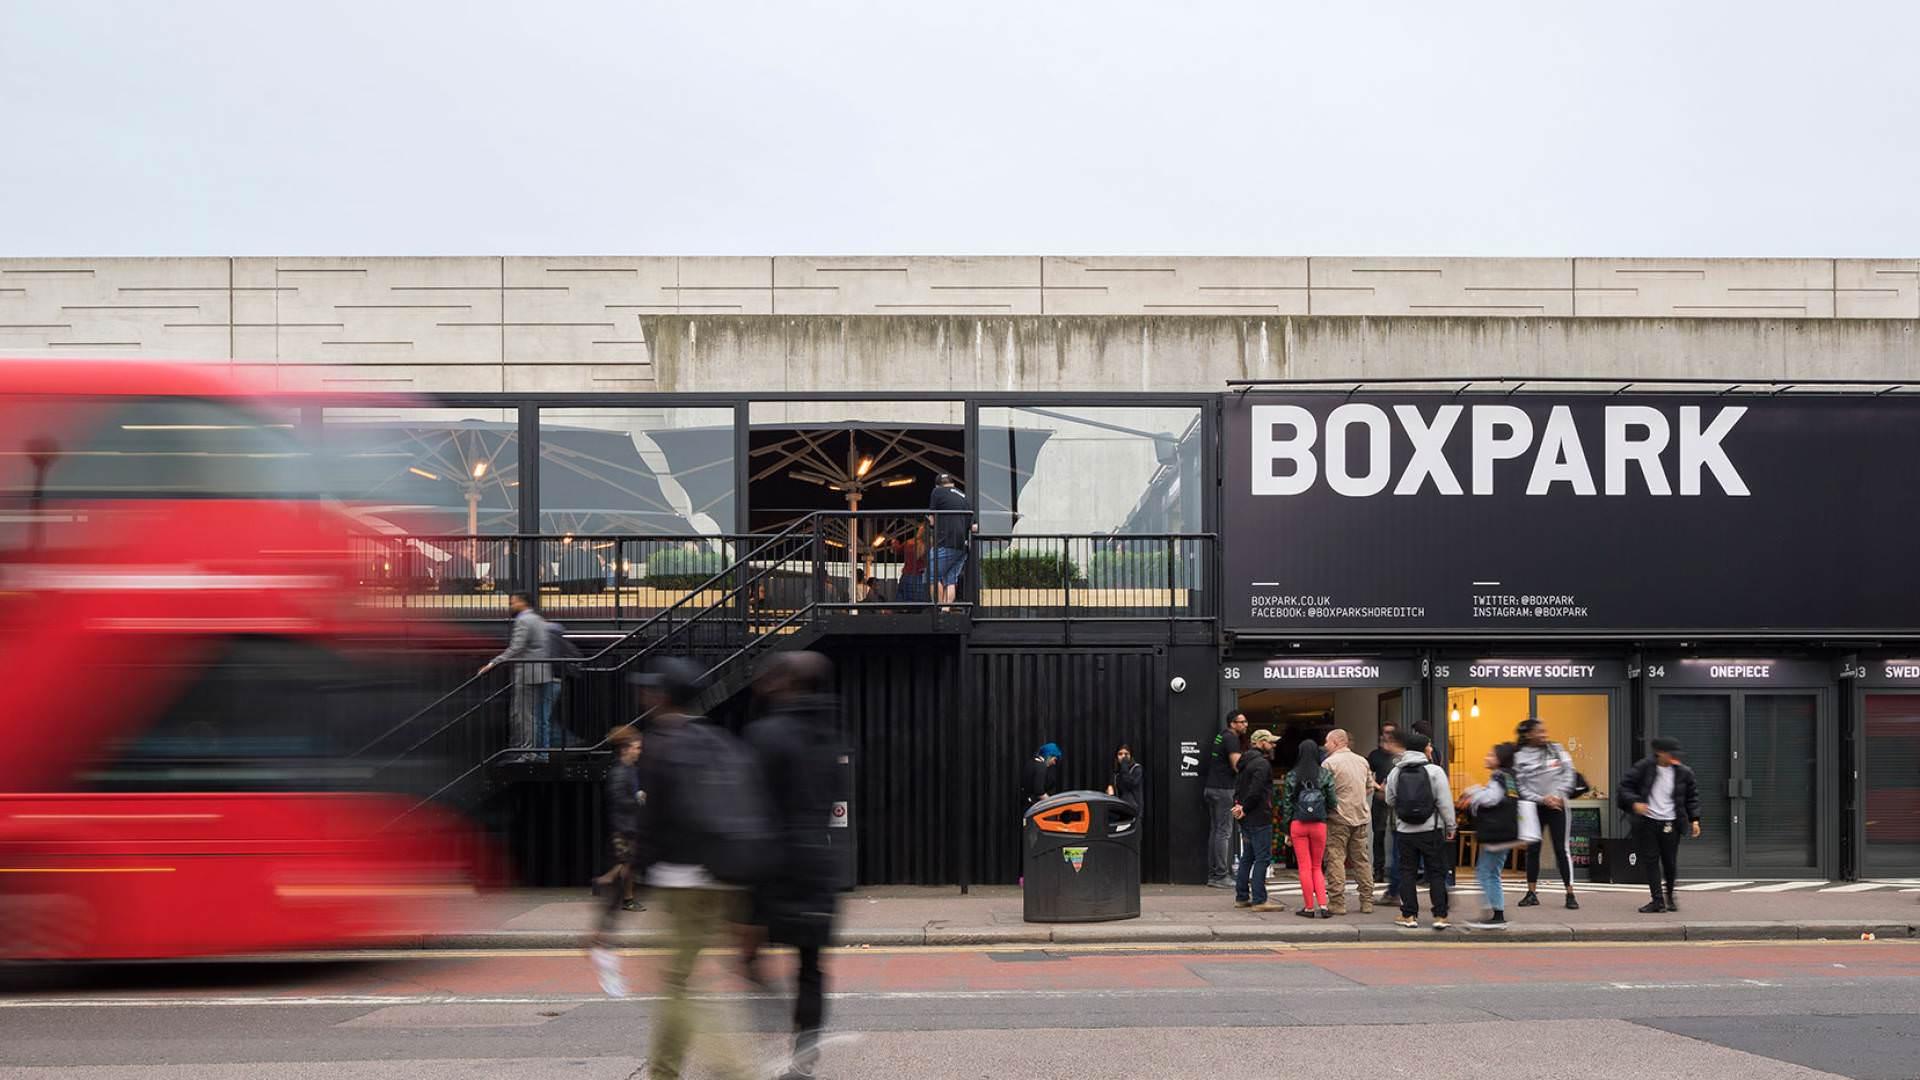 faaf825b96c52 Find Us - BOXPARK Shoreditch   Food - Shopping - Events